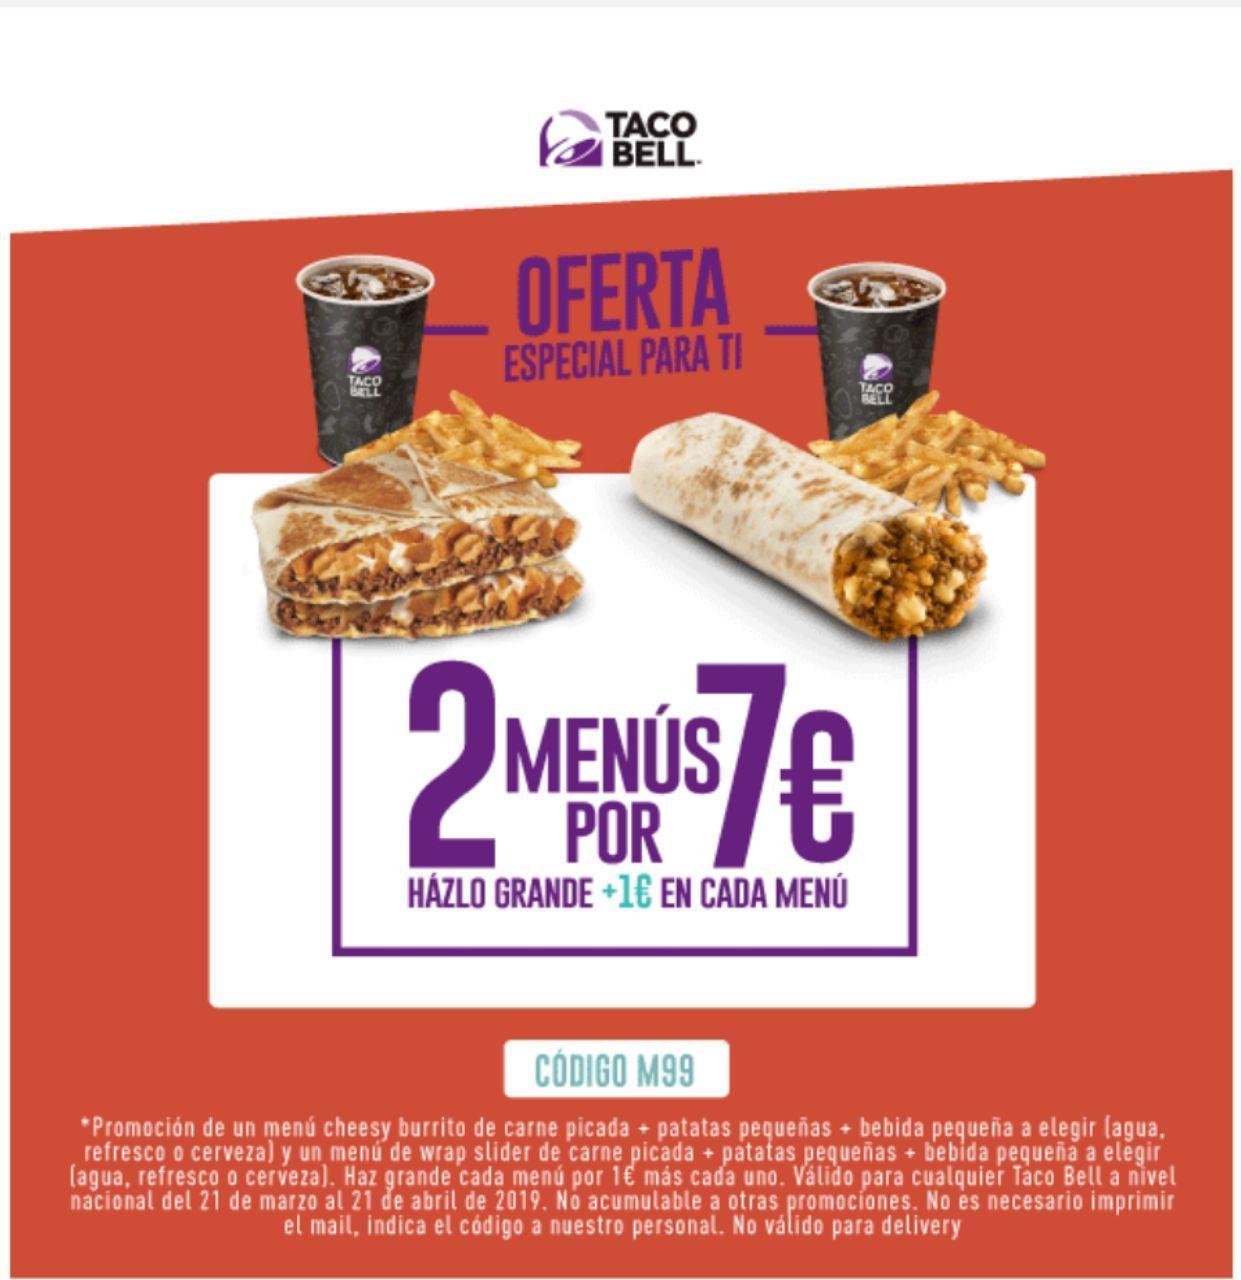 Taco Bell-Dos menús por 7€